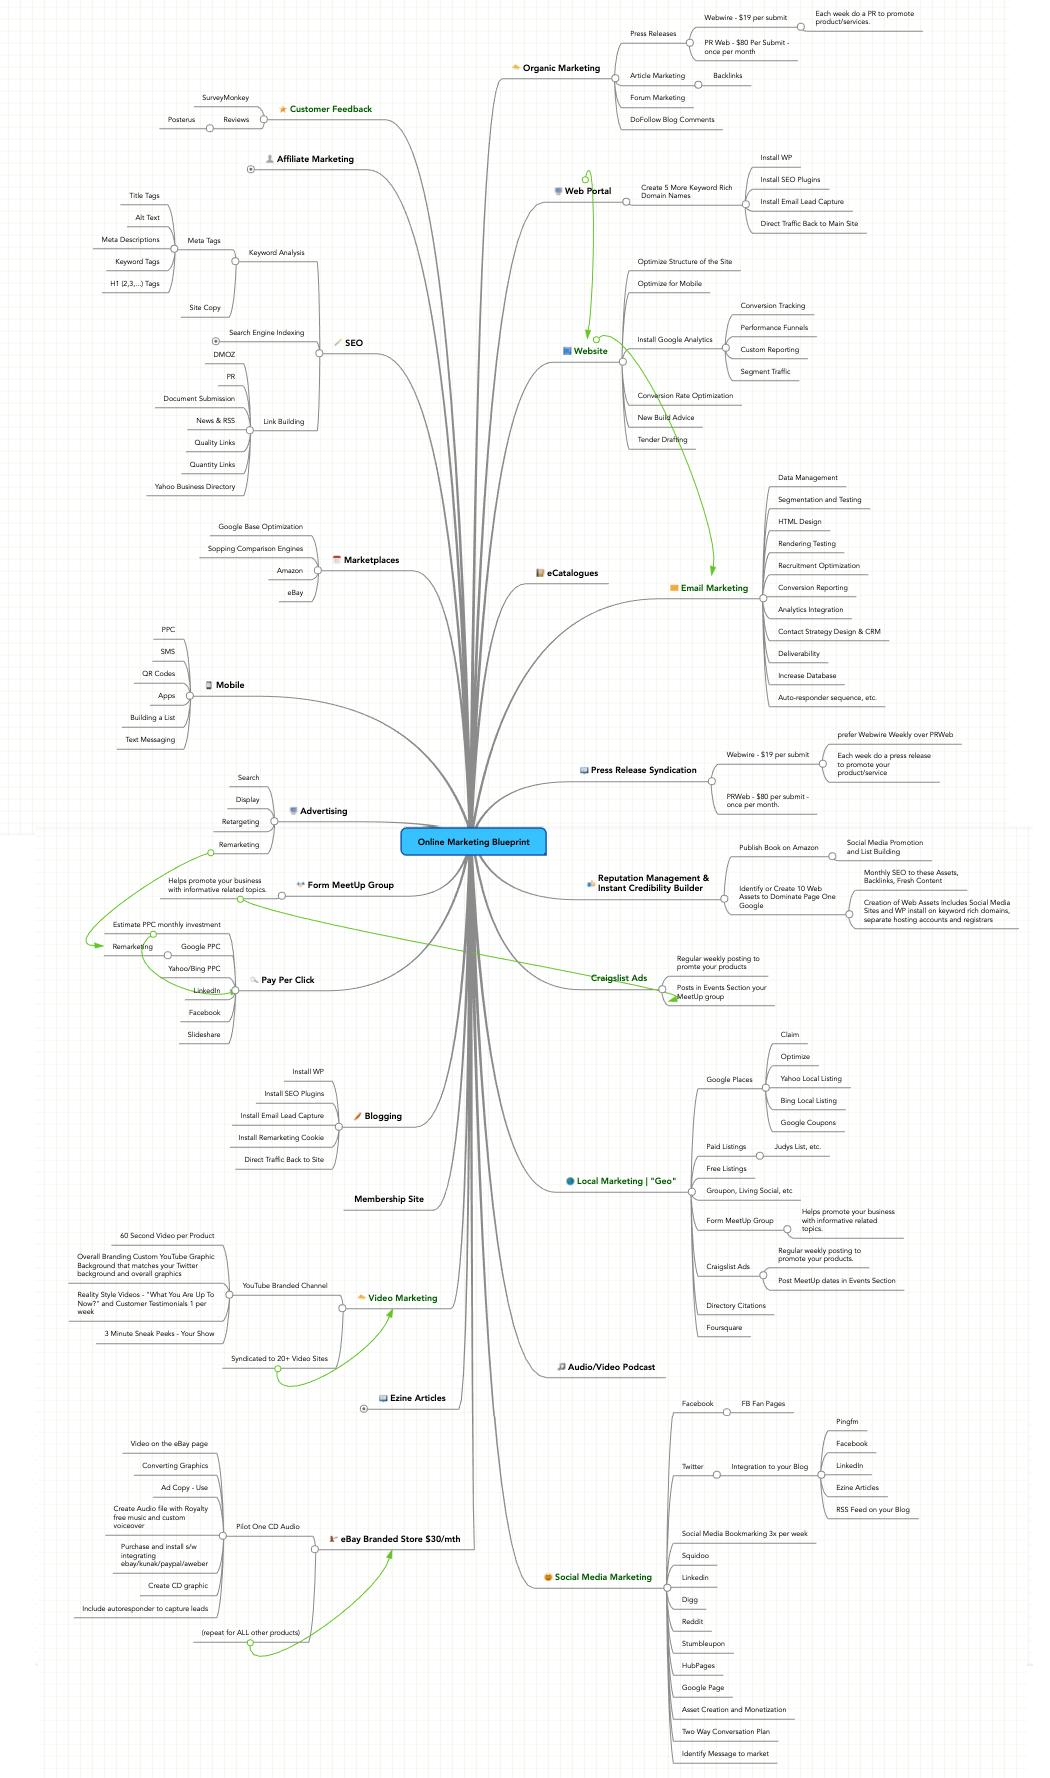 digital marketing consultant mindmap